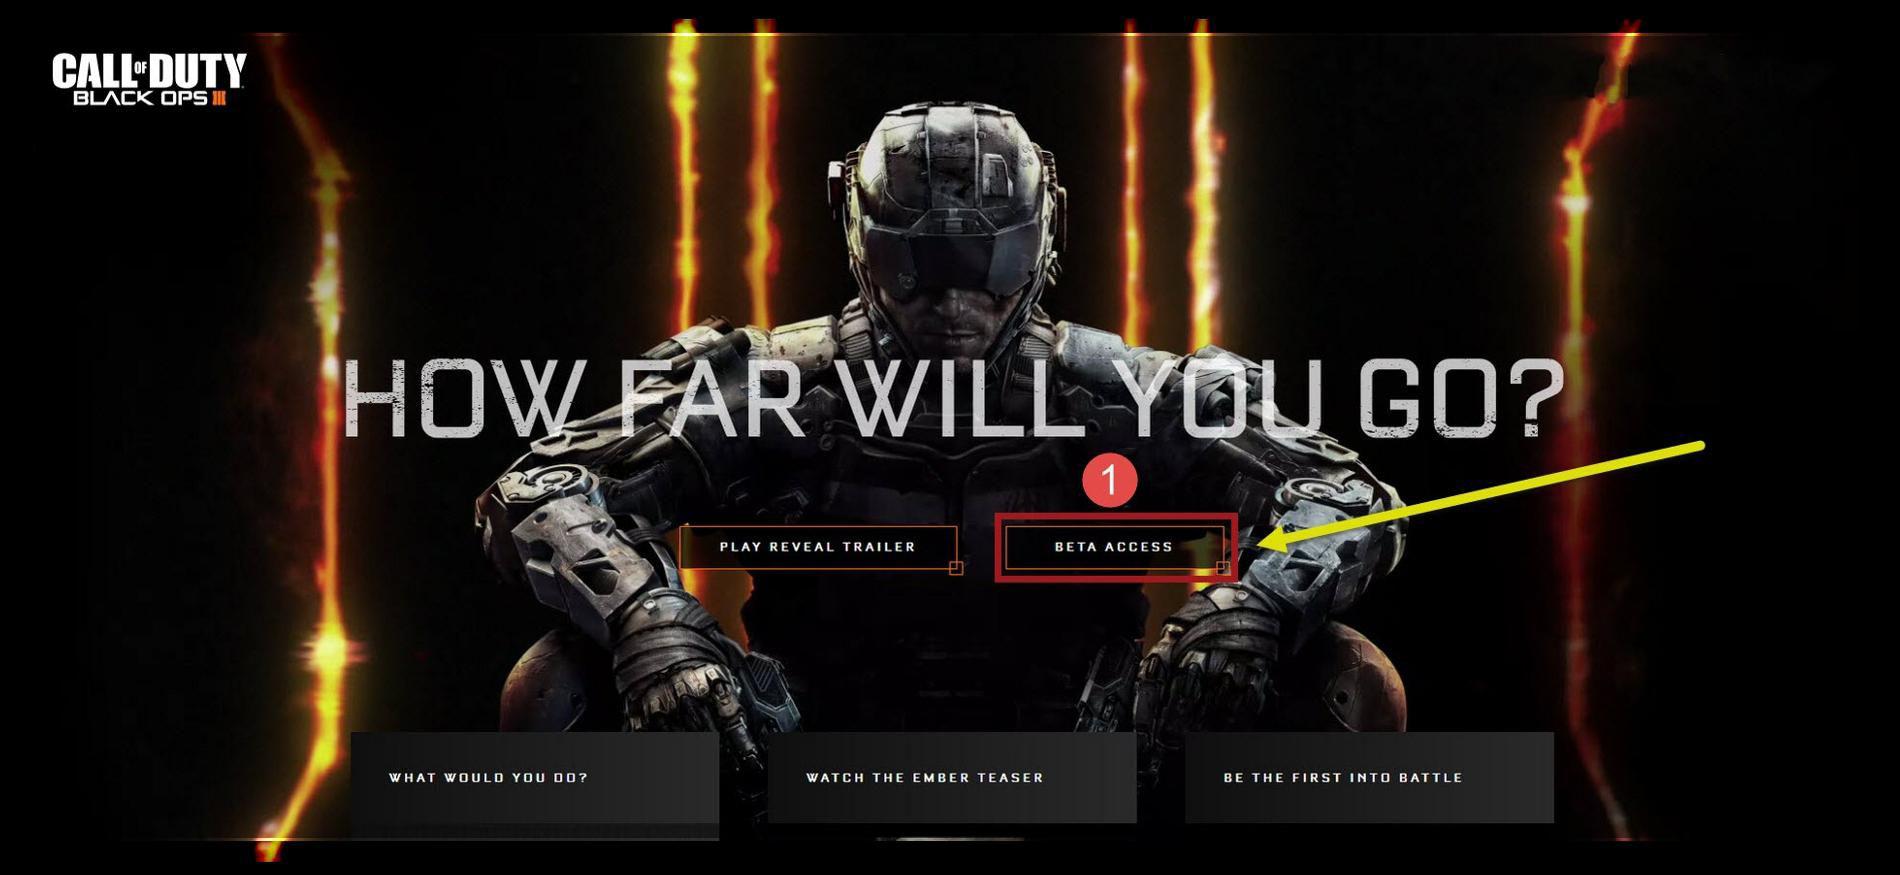 Call of Duty Black Ops 3 Multiplayer Beta Kayıt Olmak